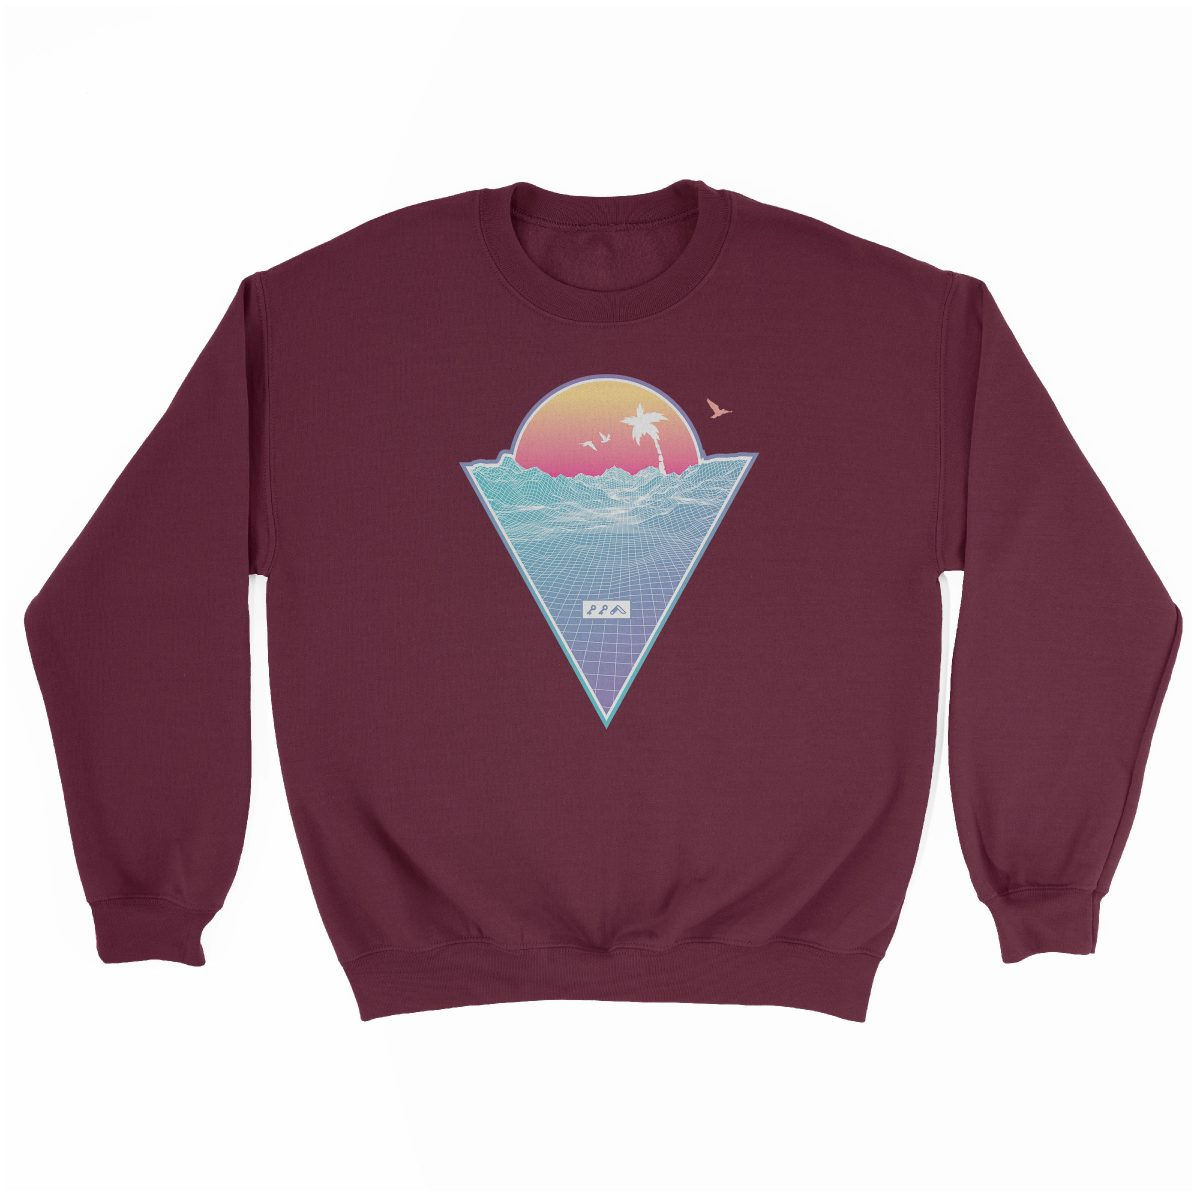 """OFF THE GRID"" cali vibes retro 80s design sweatshirt maroon at kikicutt.com"